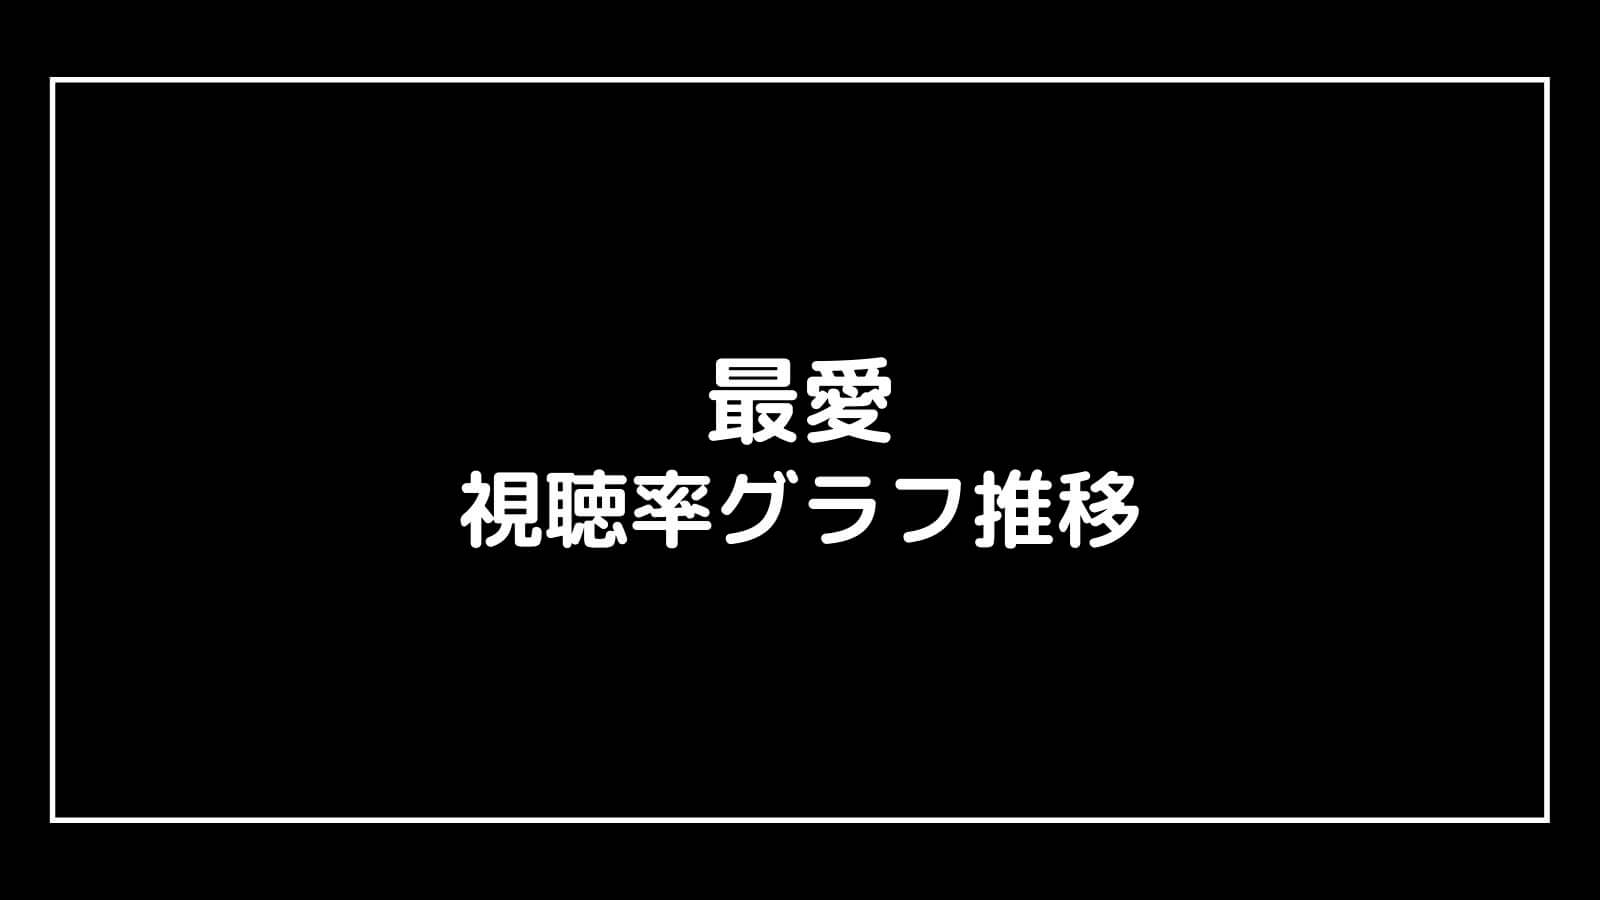 TBSドラマ『最愛』現在の視聴率速報と最終回までのグラフ推移